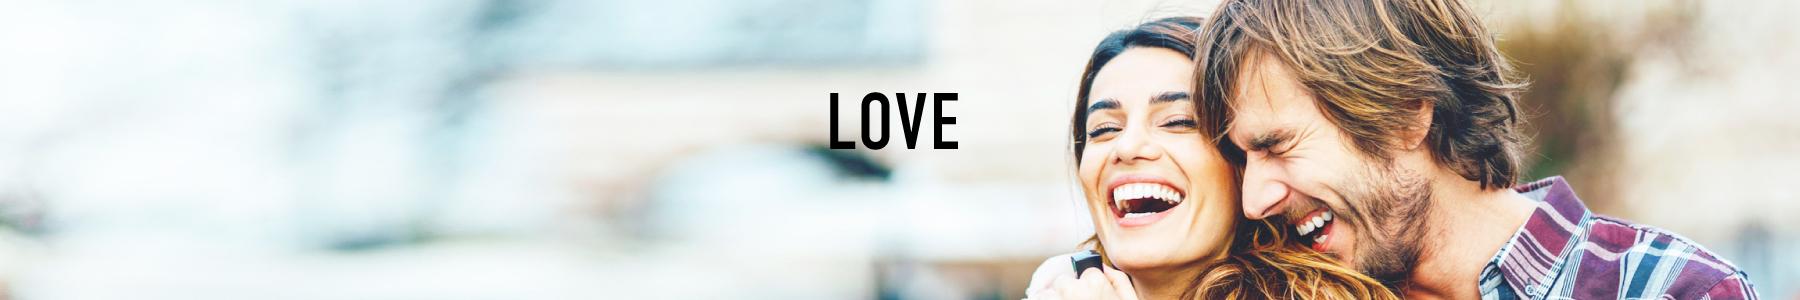 Pc love